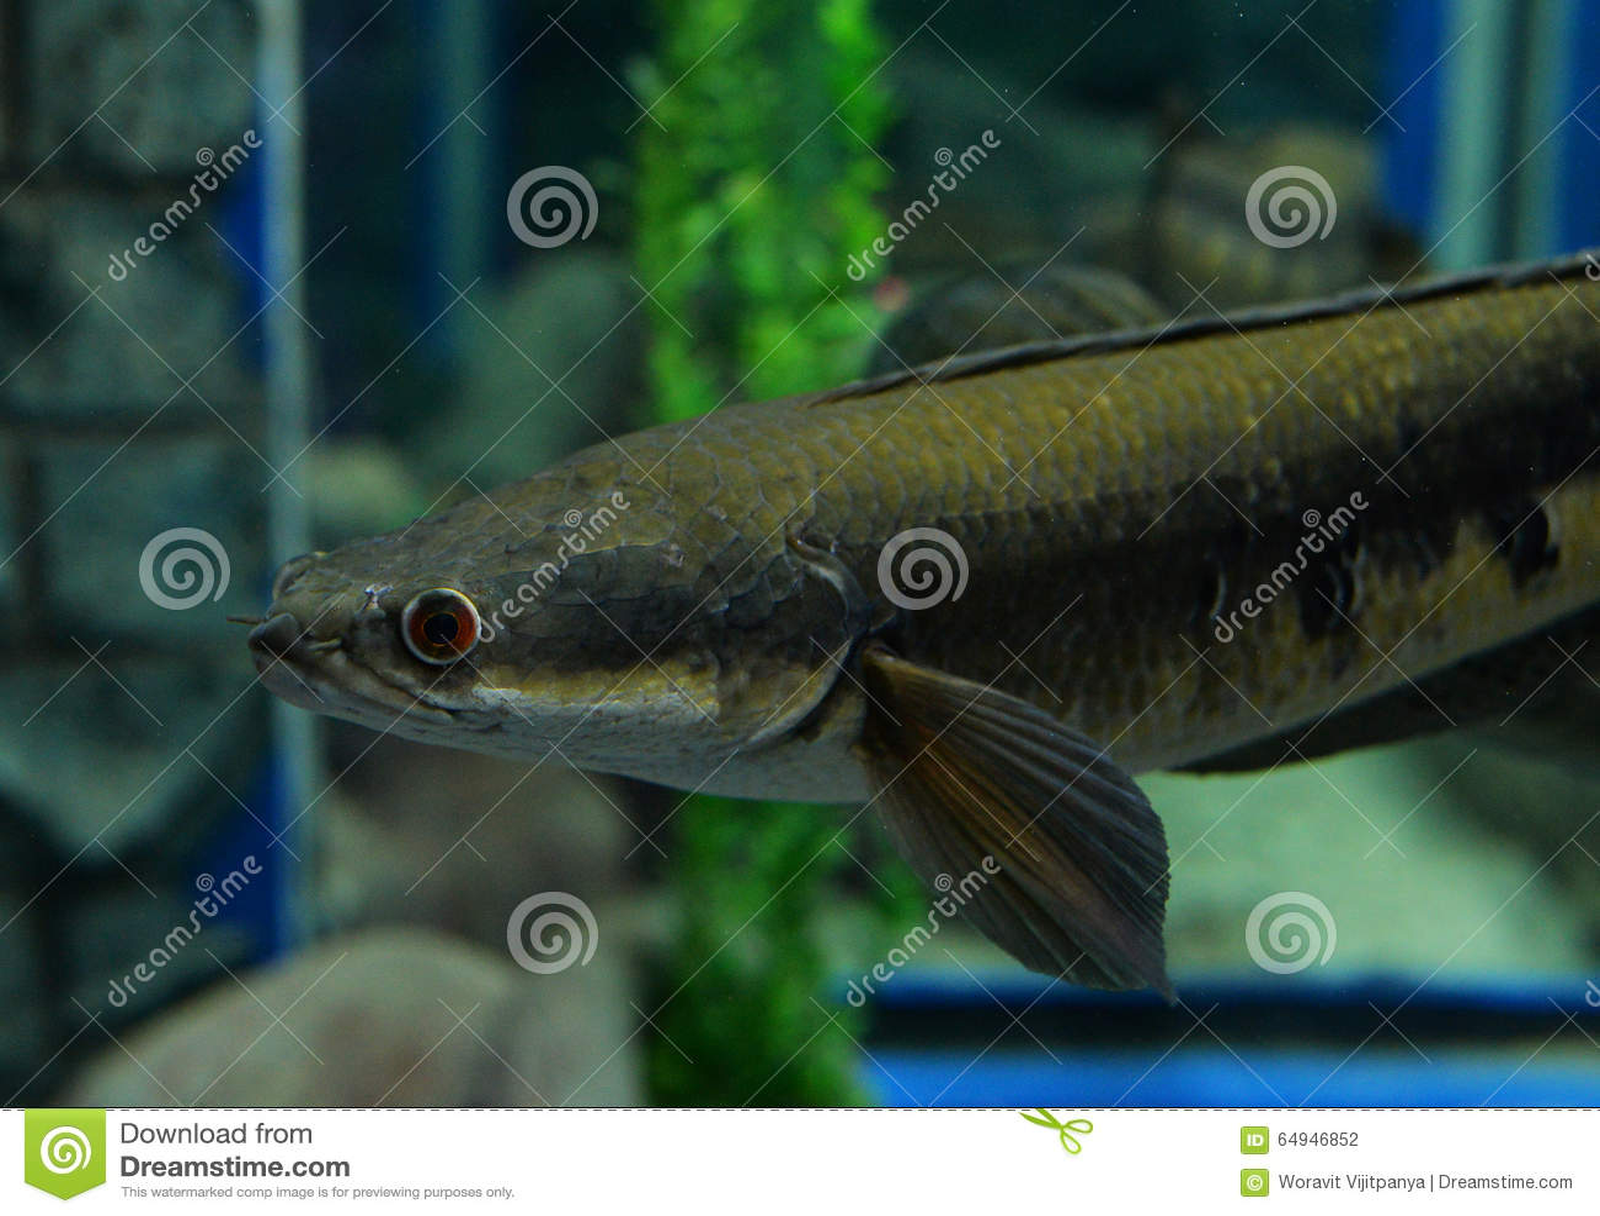 Emperor Snake Head Fish Stock Photo Image Of Background 64946852